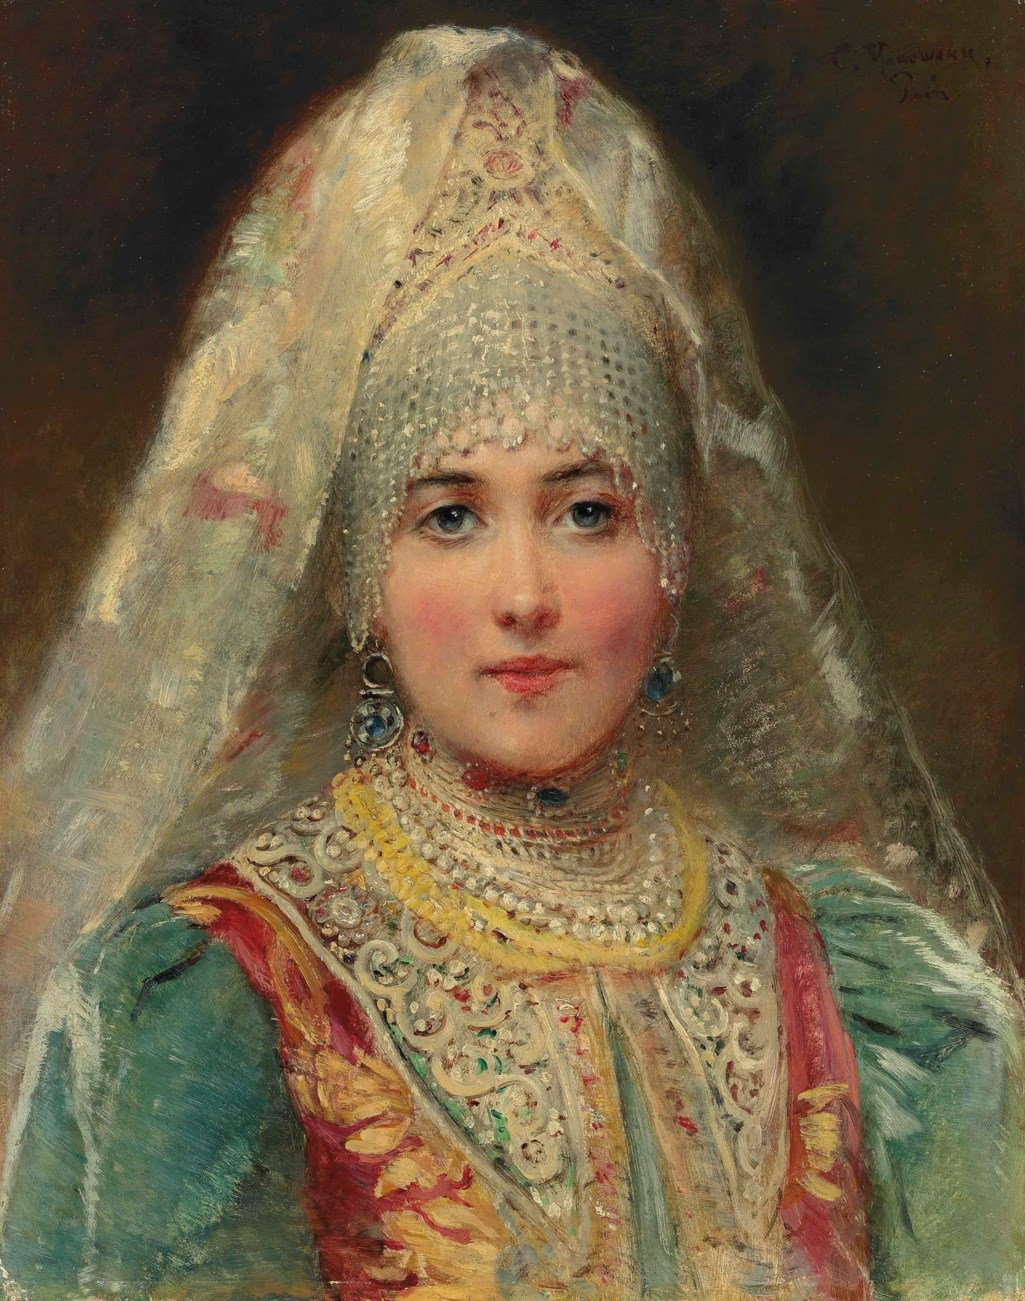 Konstantin Makovsky (1839-1915) - Boyarina